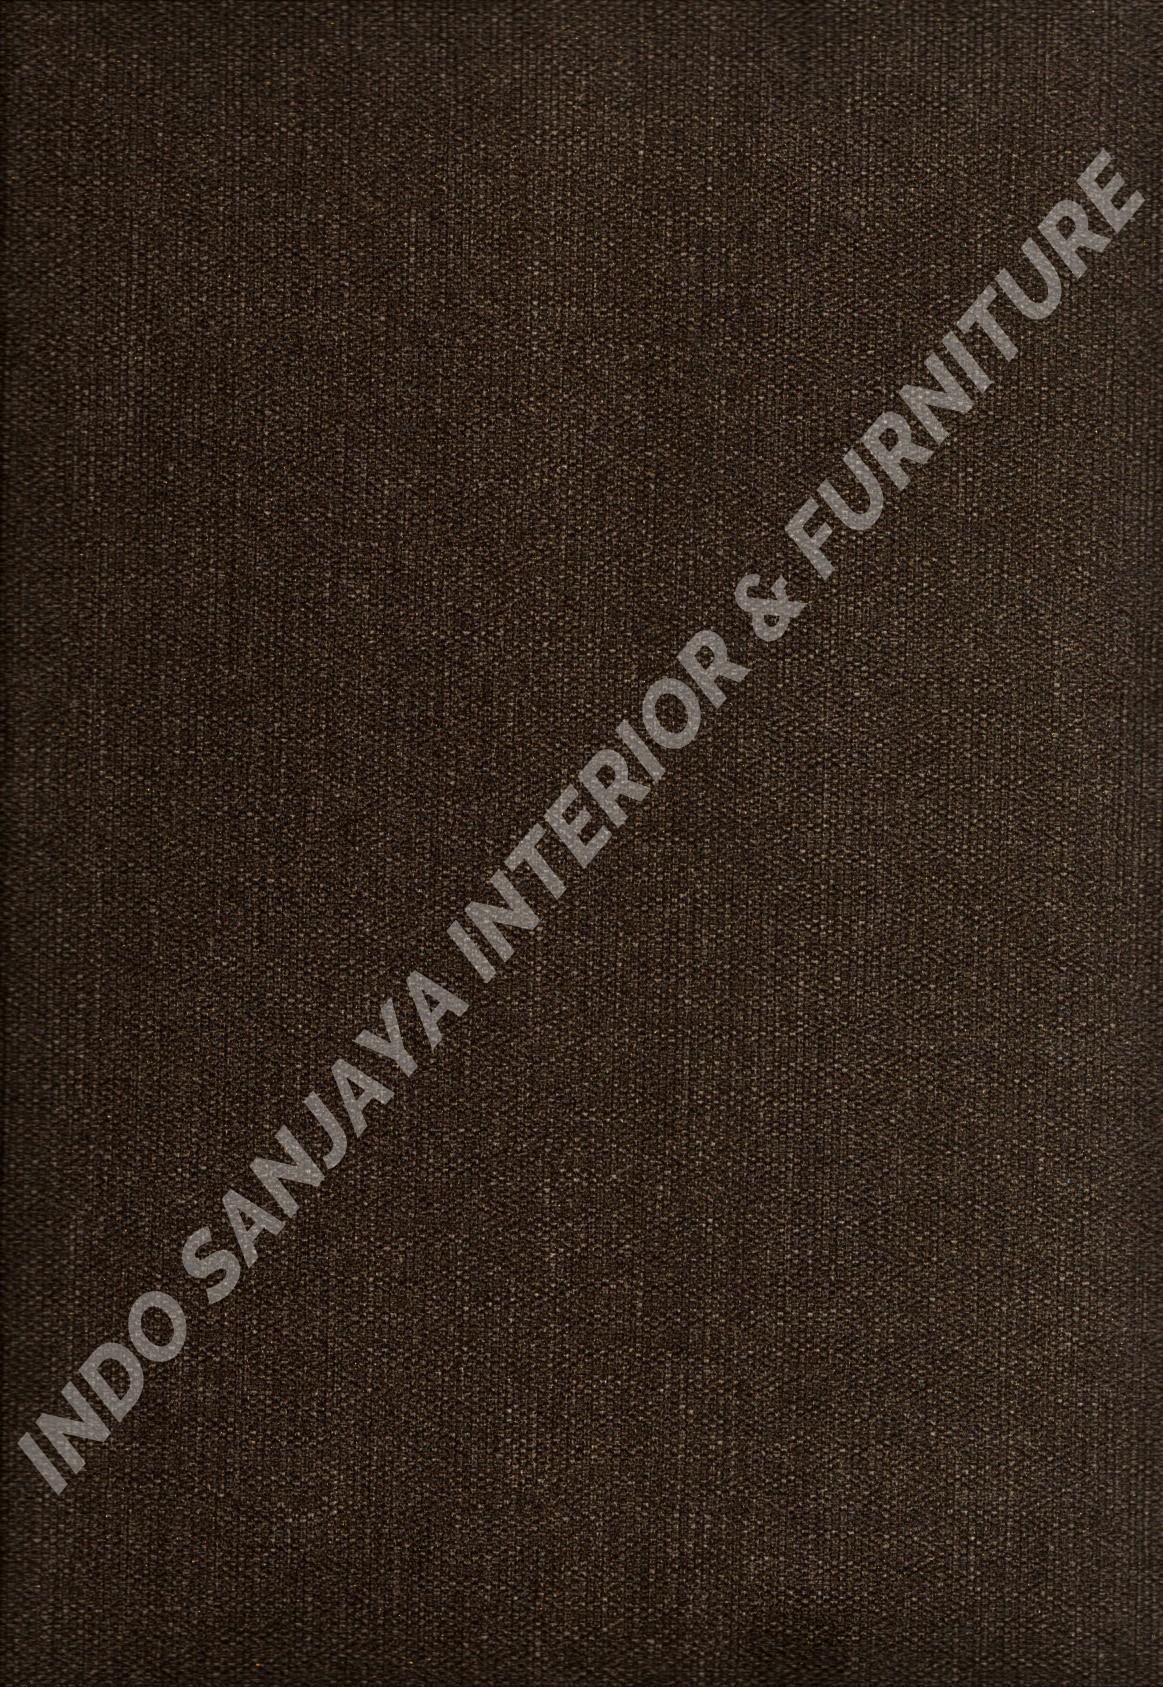 wallpaper   Wallpaper Minimalis Polos 87035:87035 corak  warna